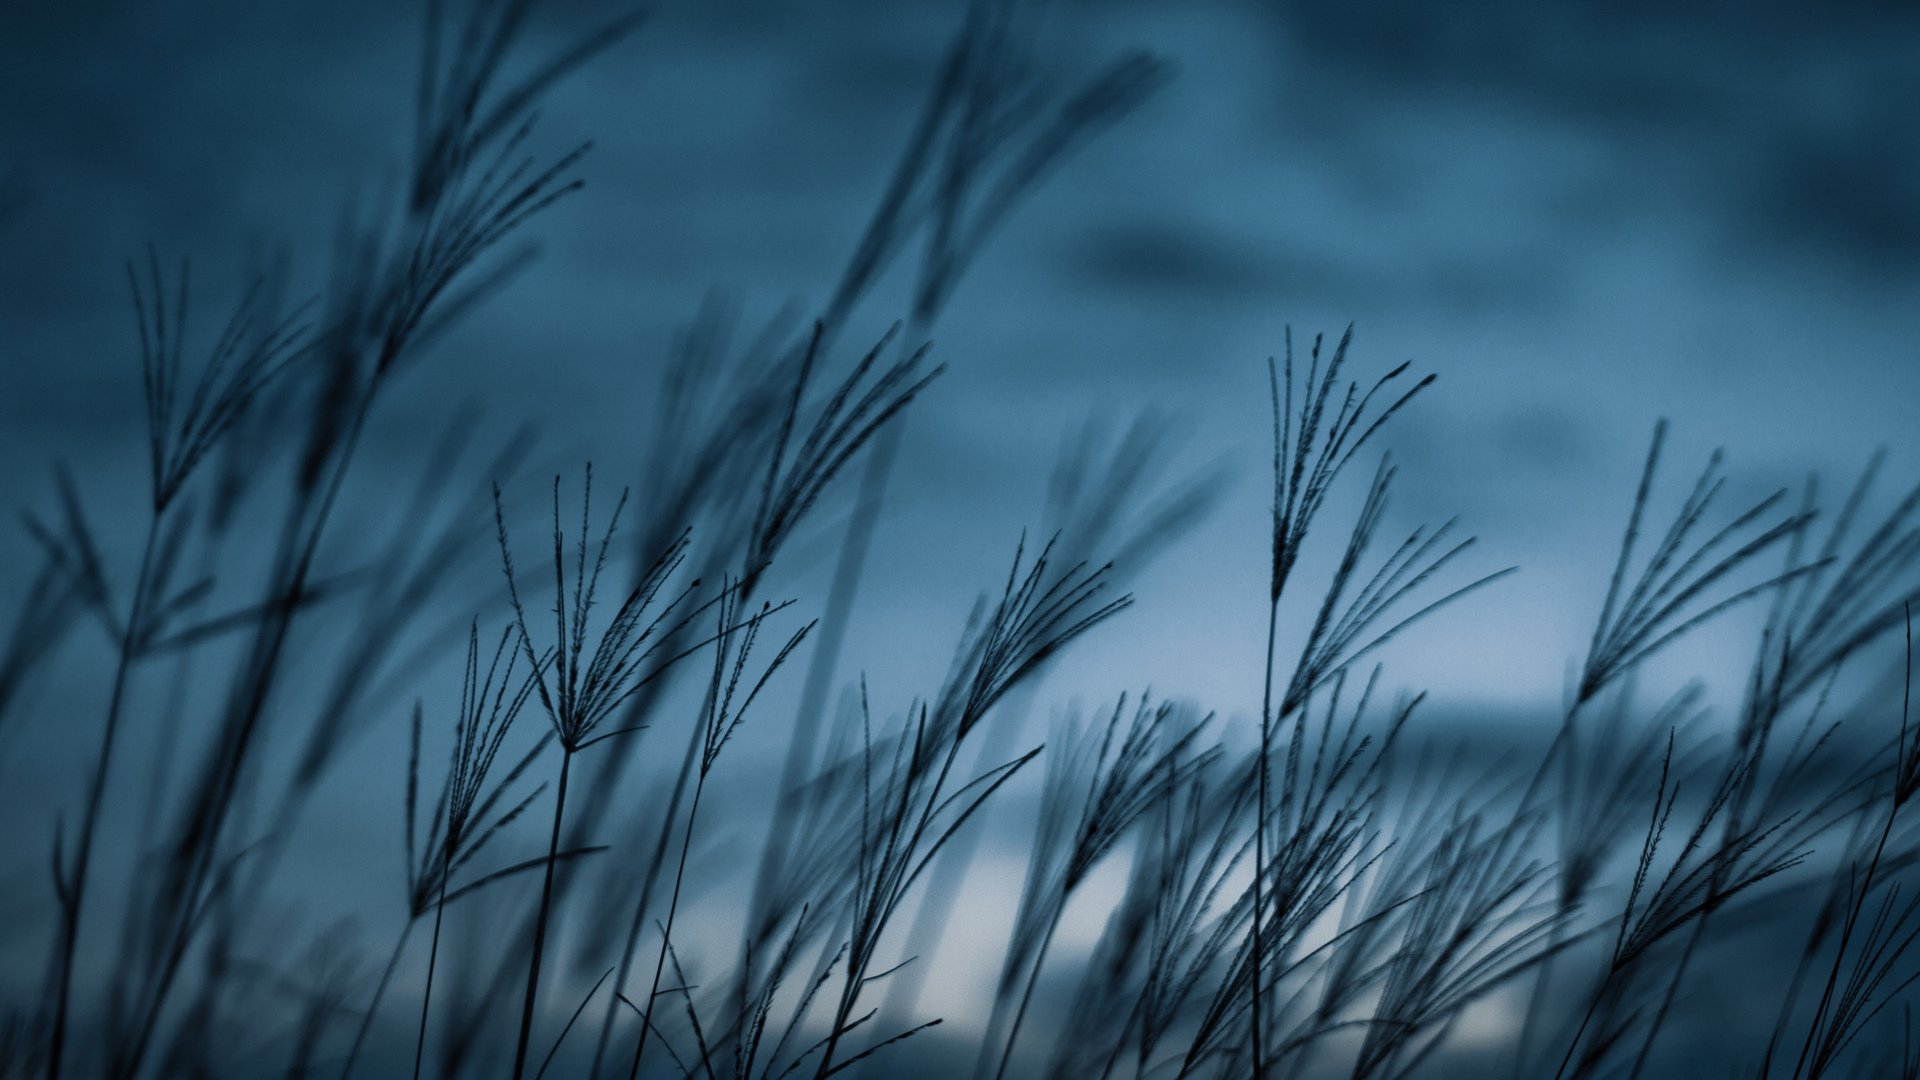 Blue Aesthetic Wallpaper Image